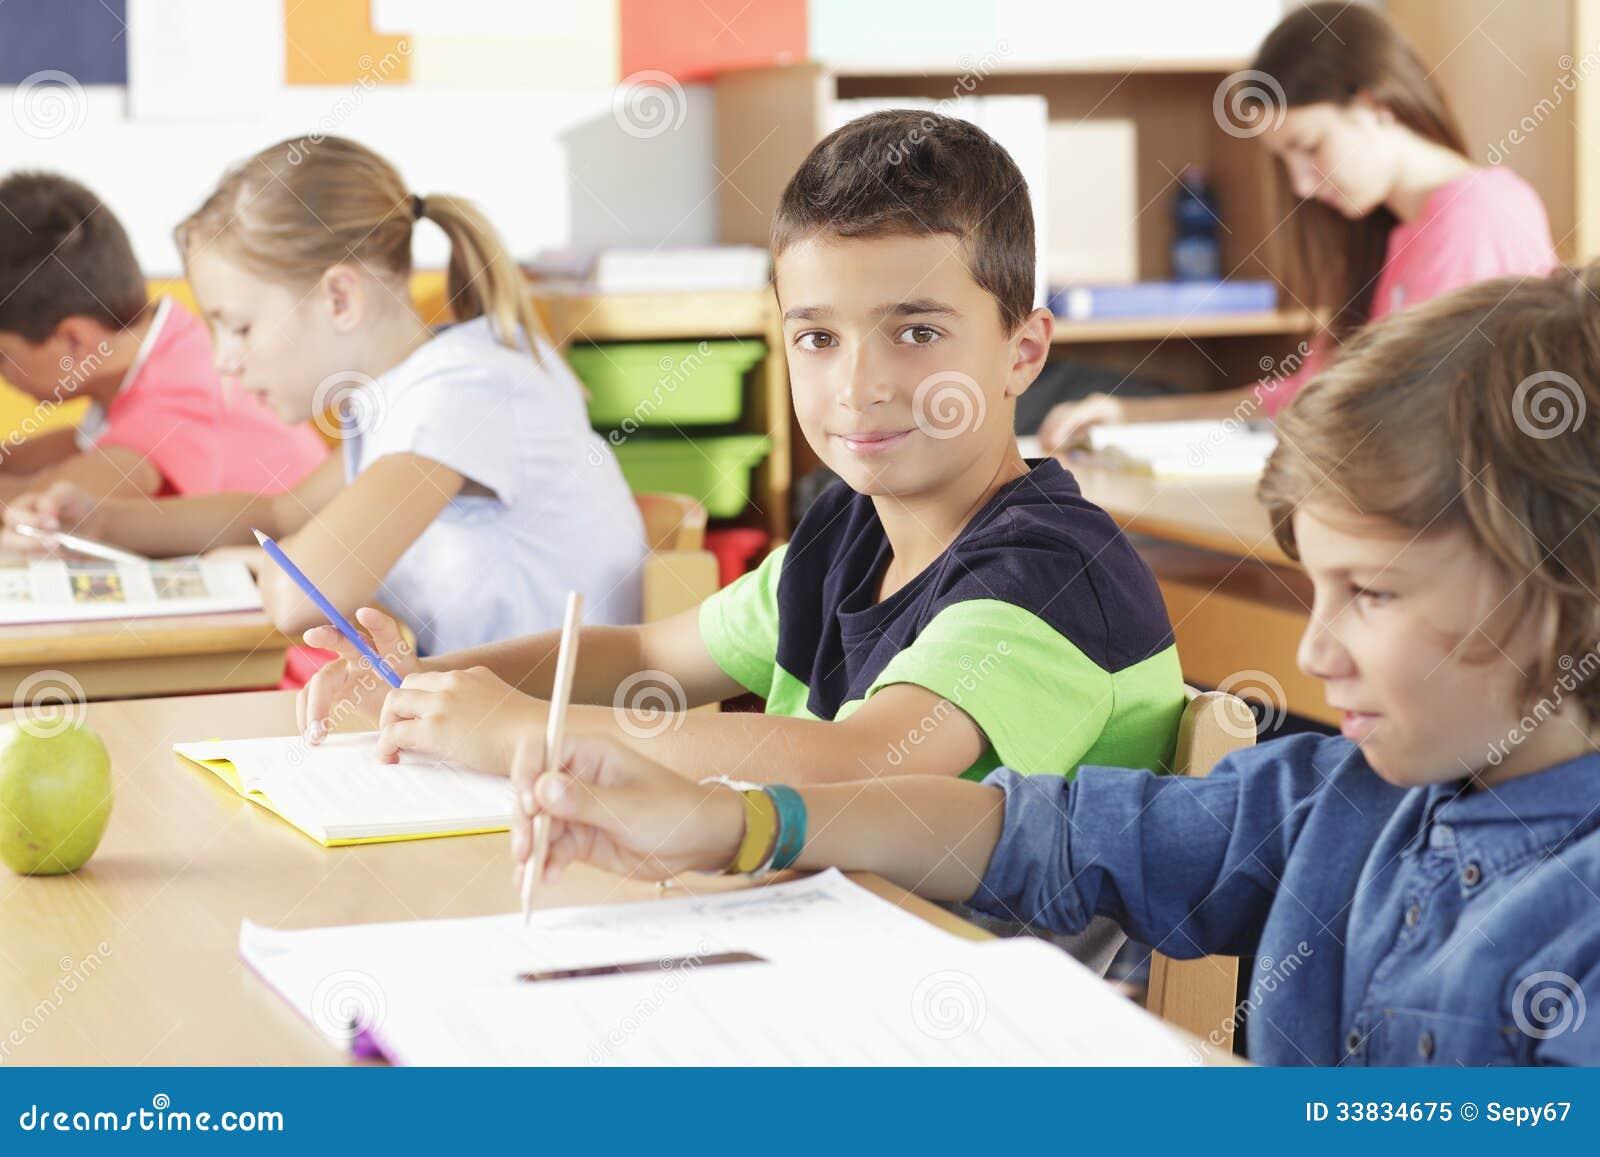 Elementary Classrooms Writing ~ Elementary school classroom royalty free stock photo